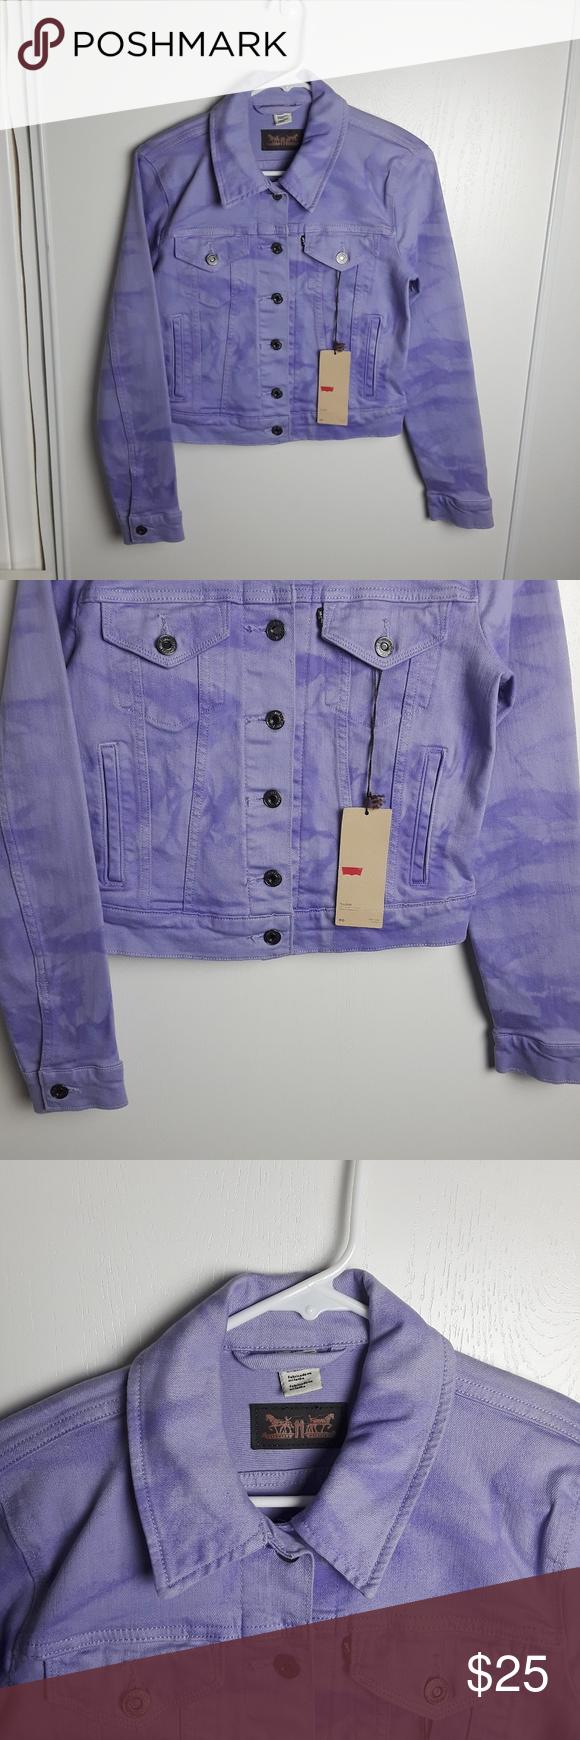 Nwt Levi S Lavender Tie Dye Denim Trucker Jacket Tie Dye Denim Denim Jackets [ 1740 x 580 Pixel ]